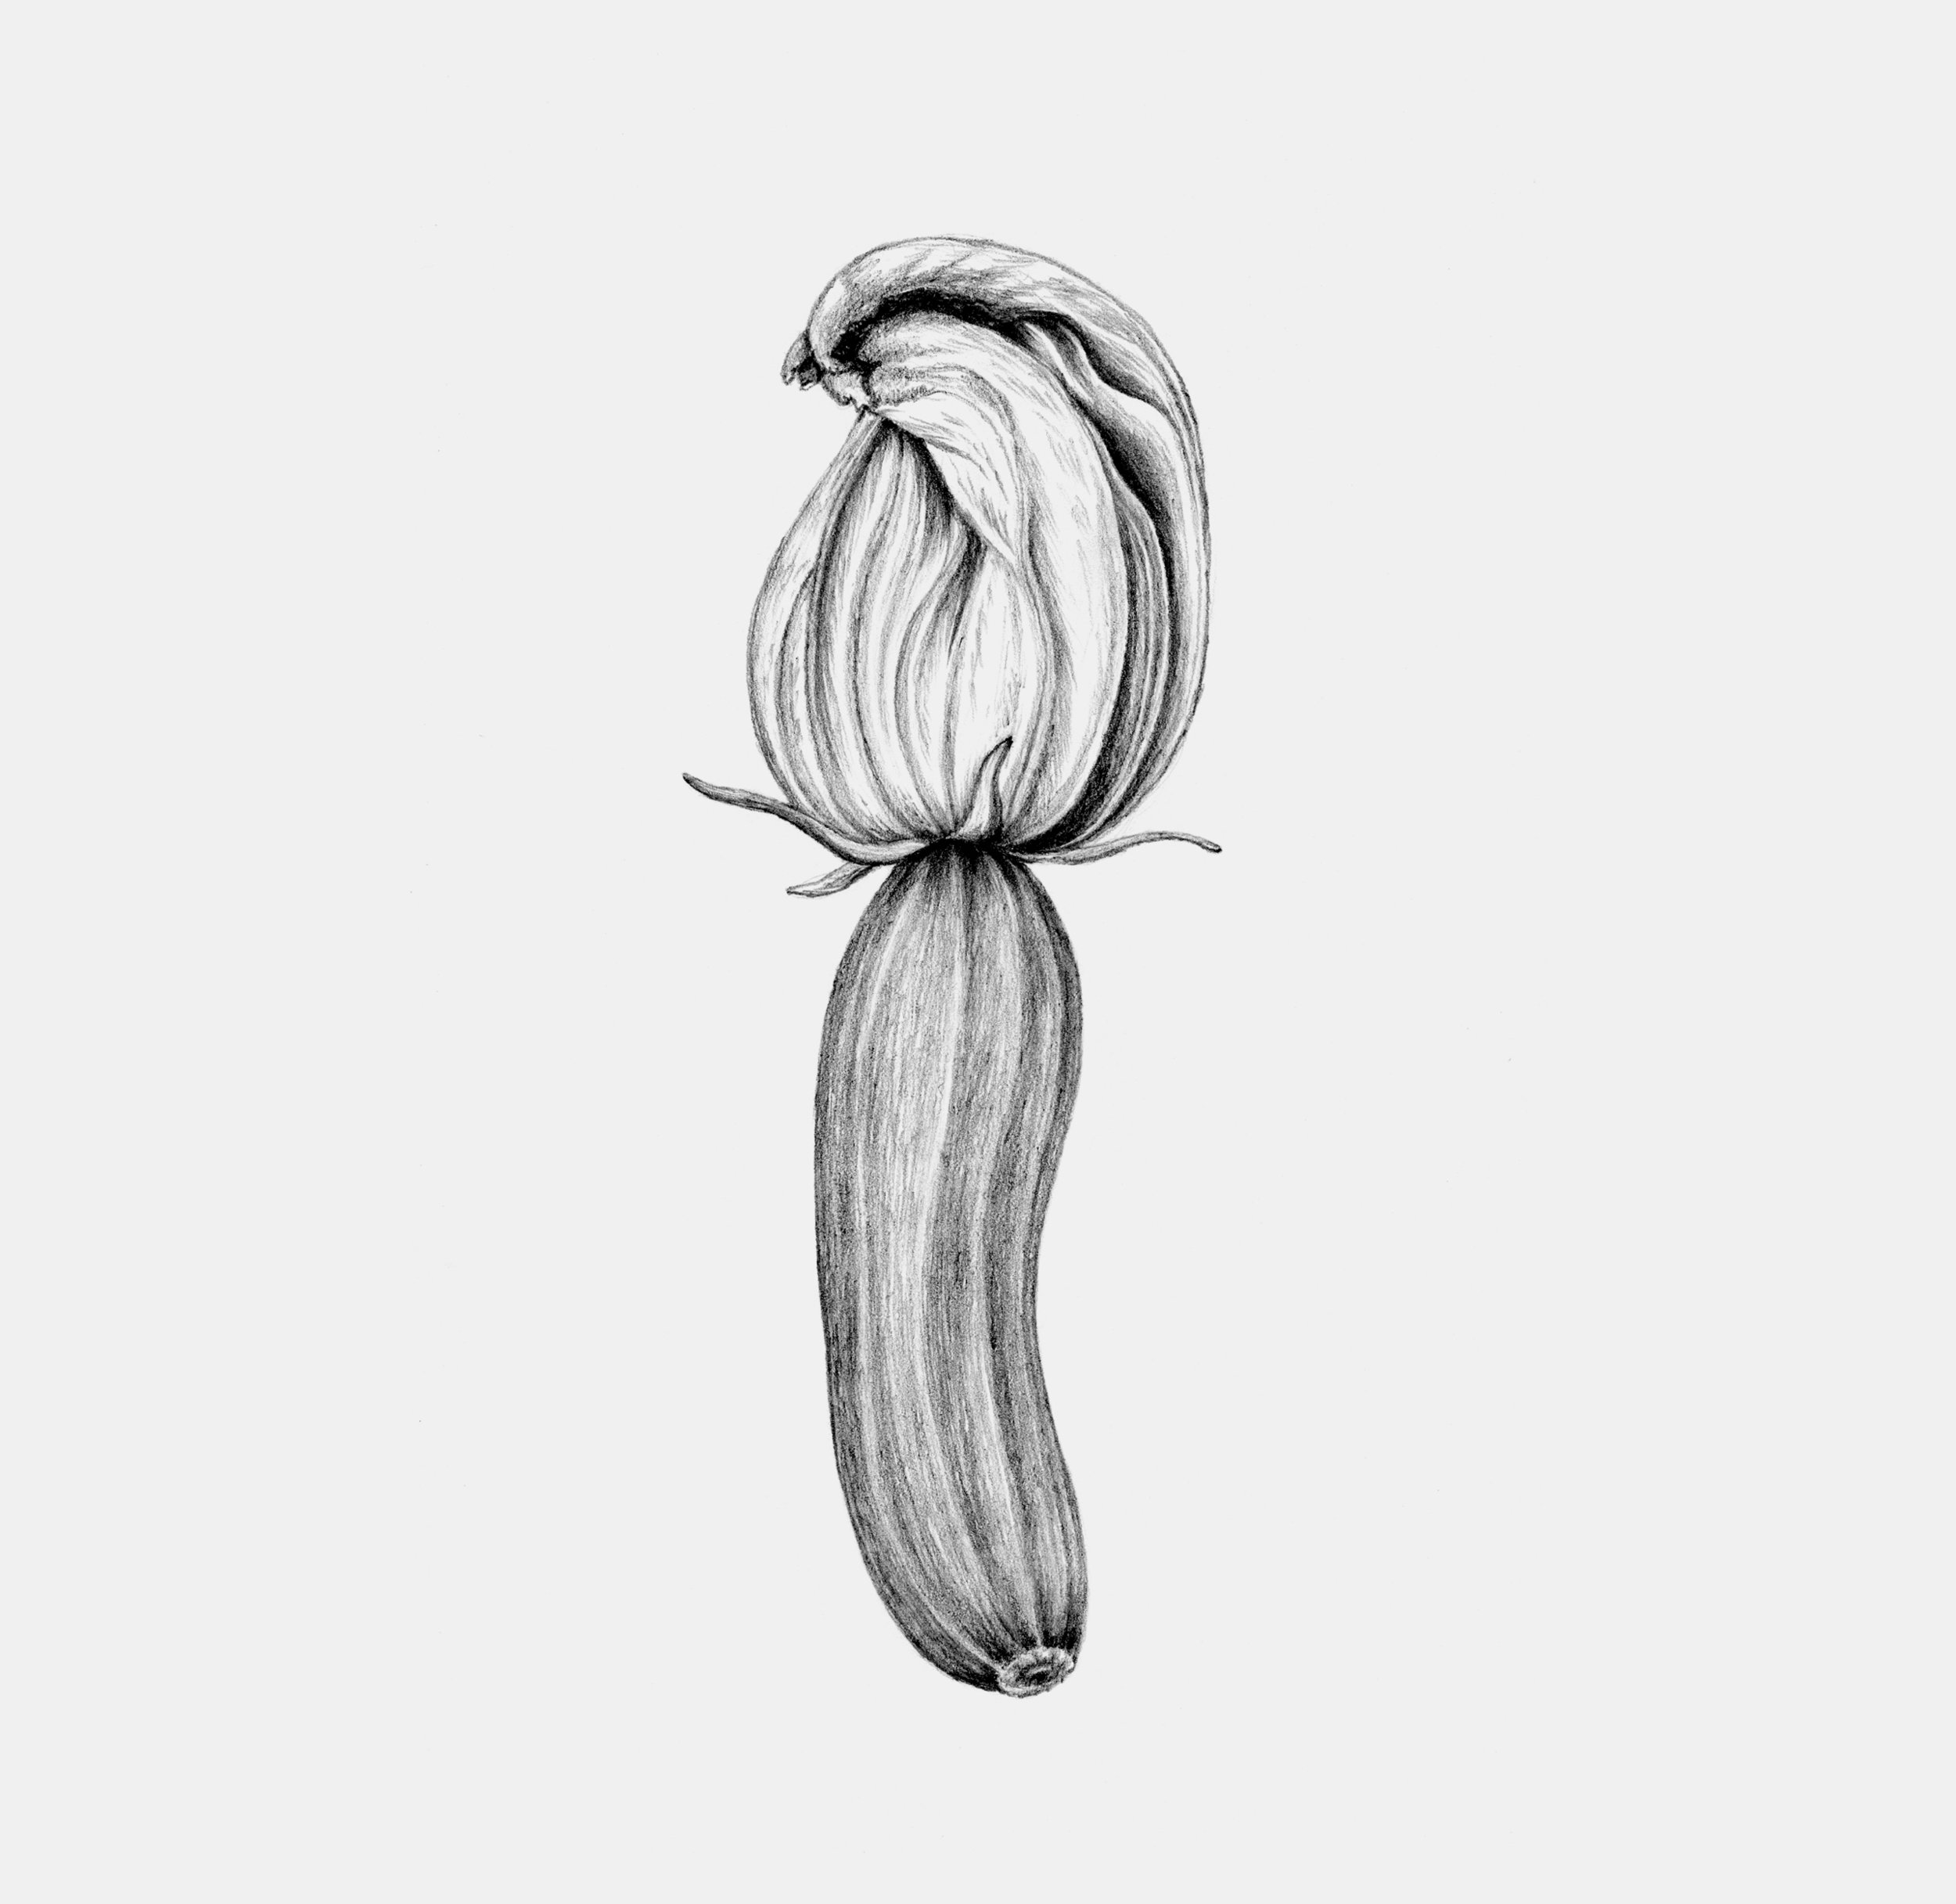 Zucchini/squash med blomst / Zucchini Blossom.  Anne Løvenskjold for Sigridsminde